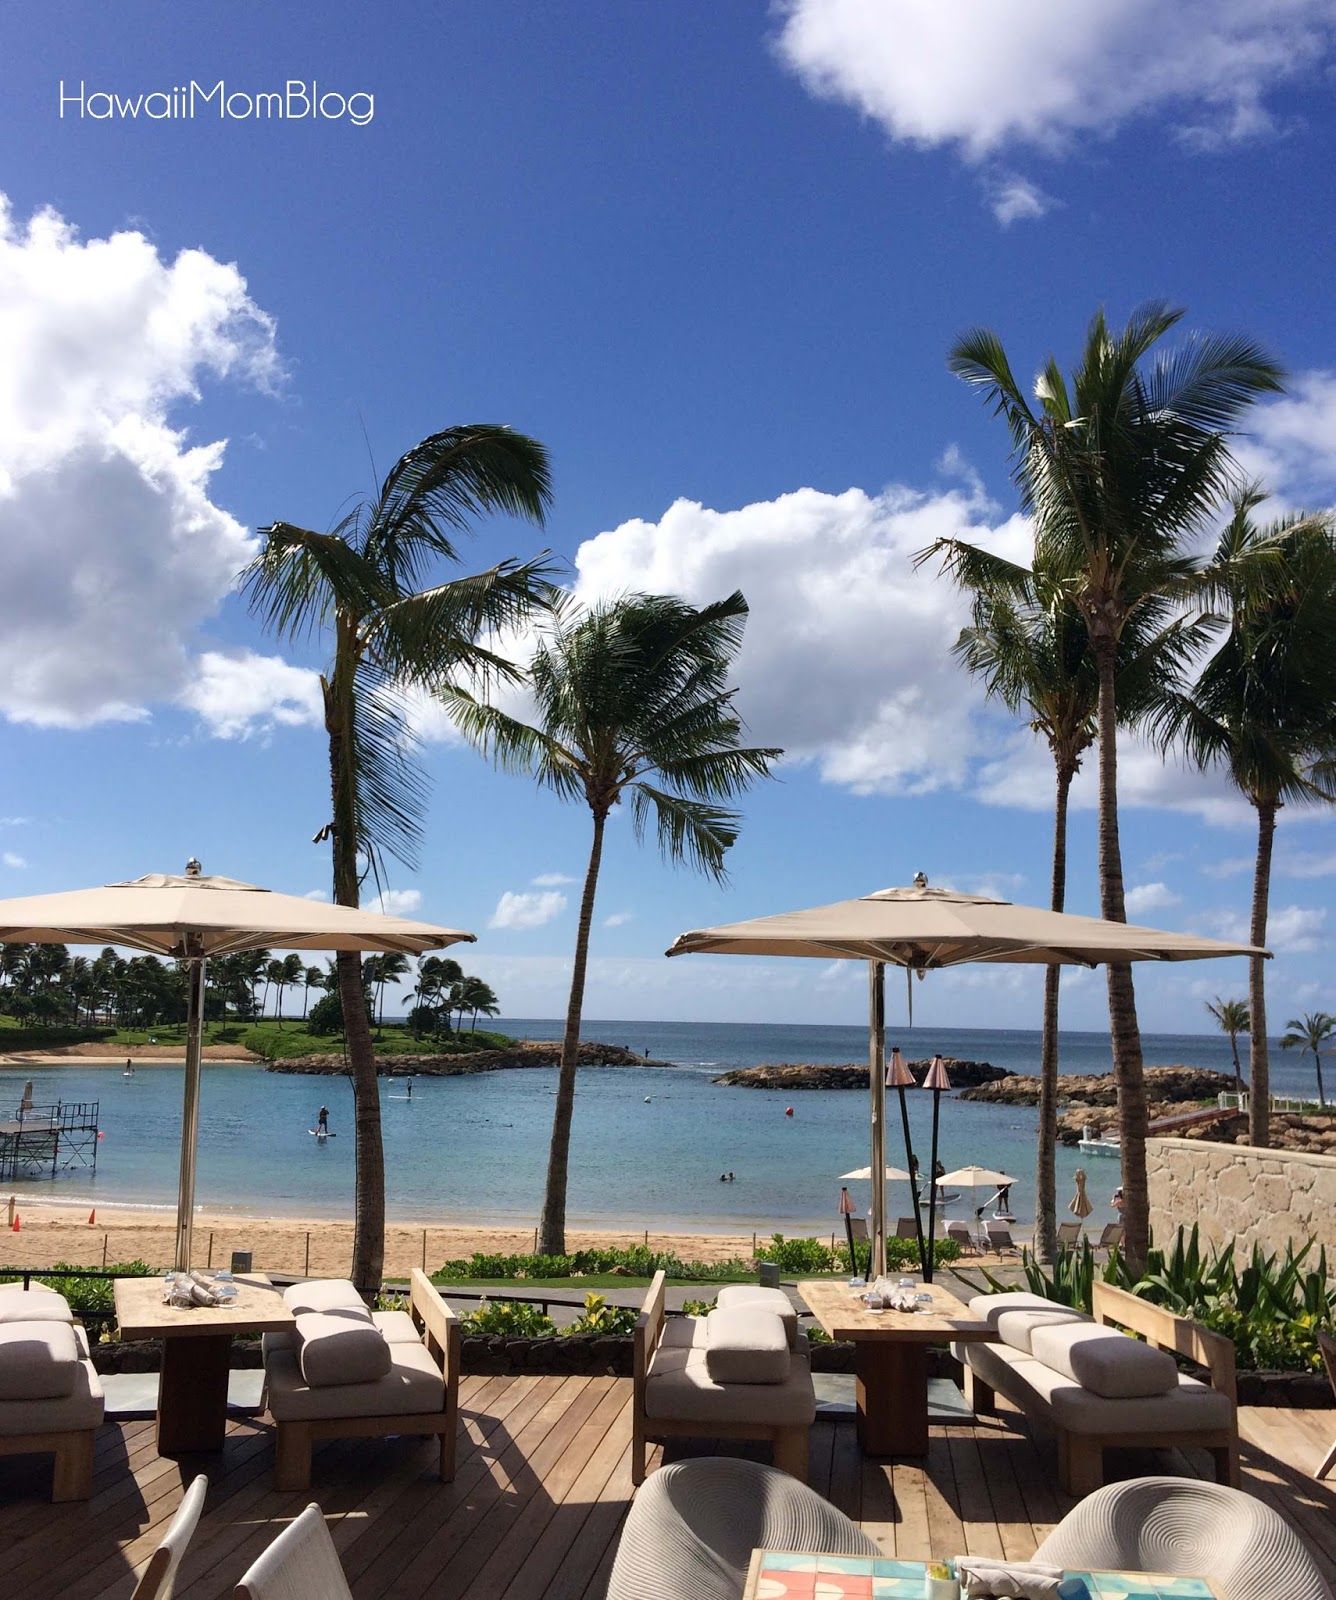 Hawaii mom blog sunday brunch on the beach at fish house for Fish house ko olina